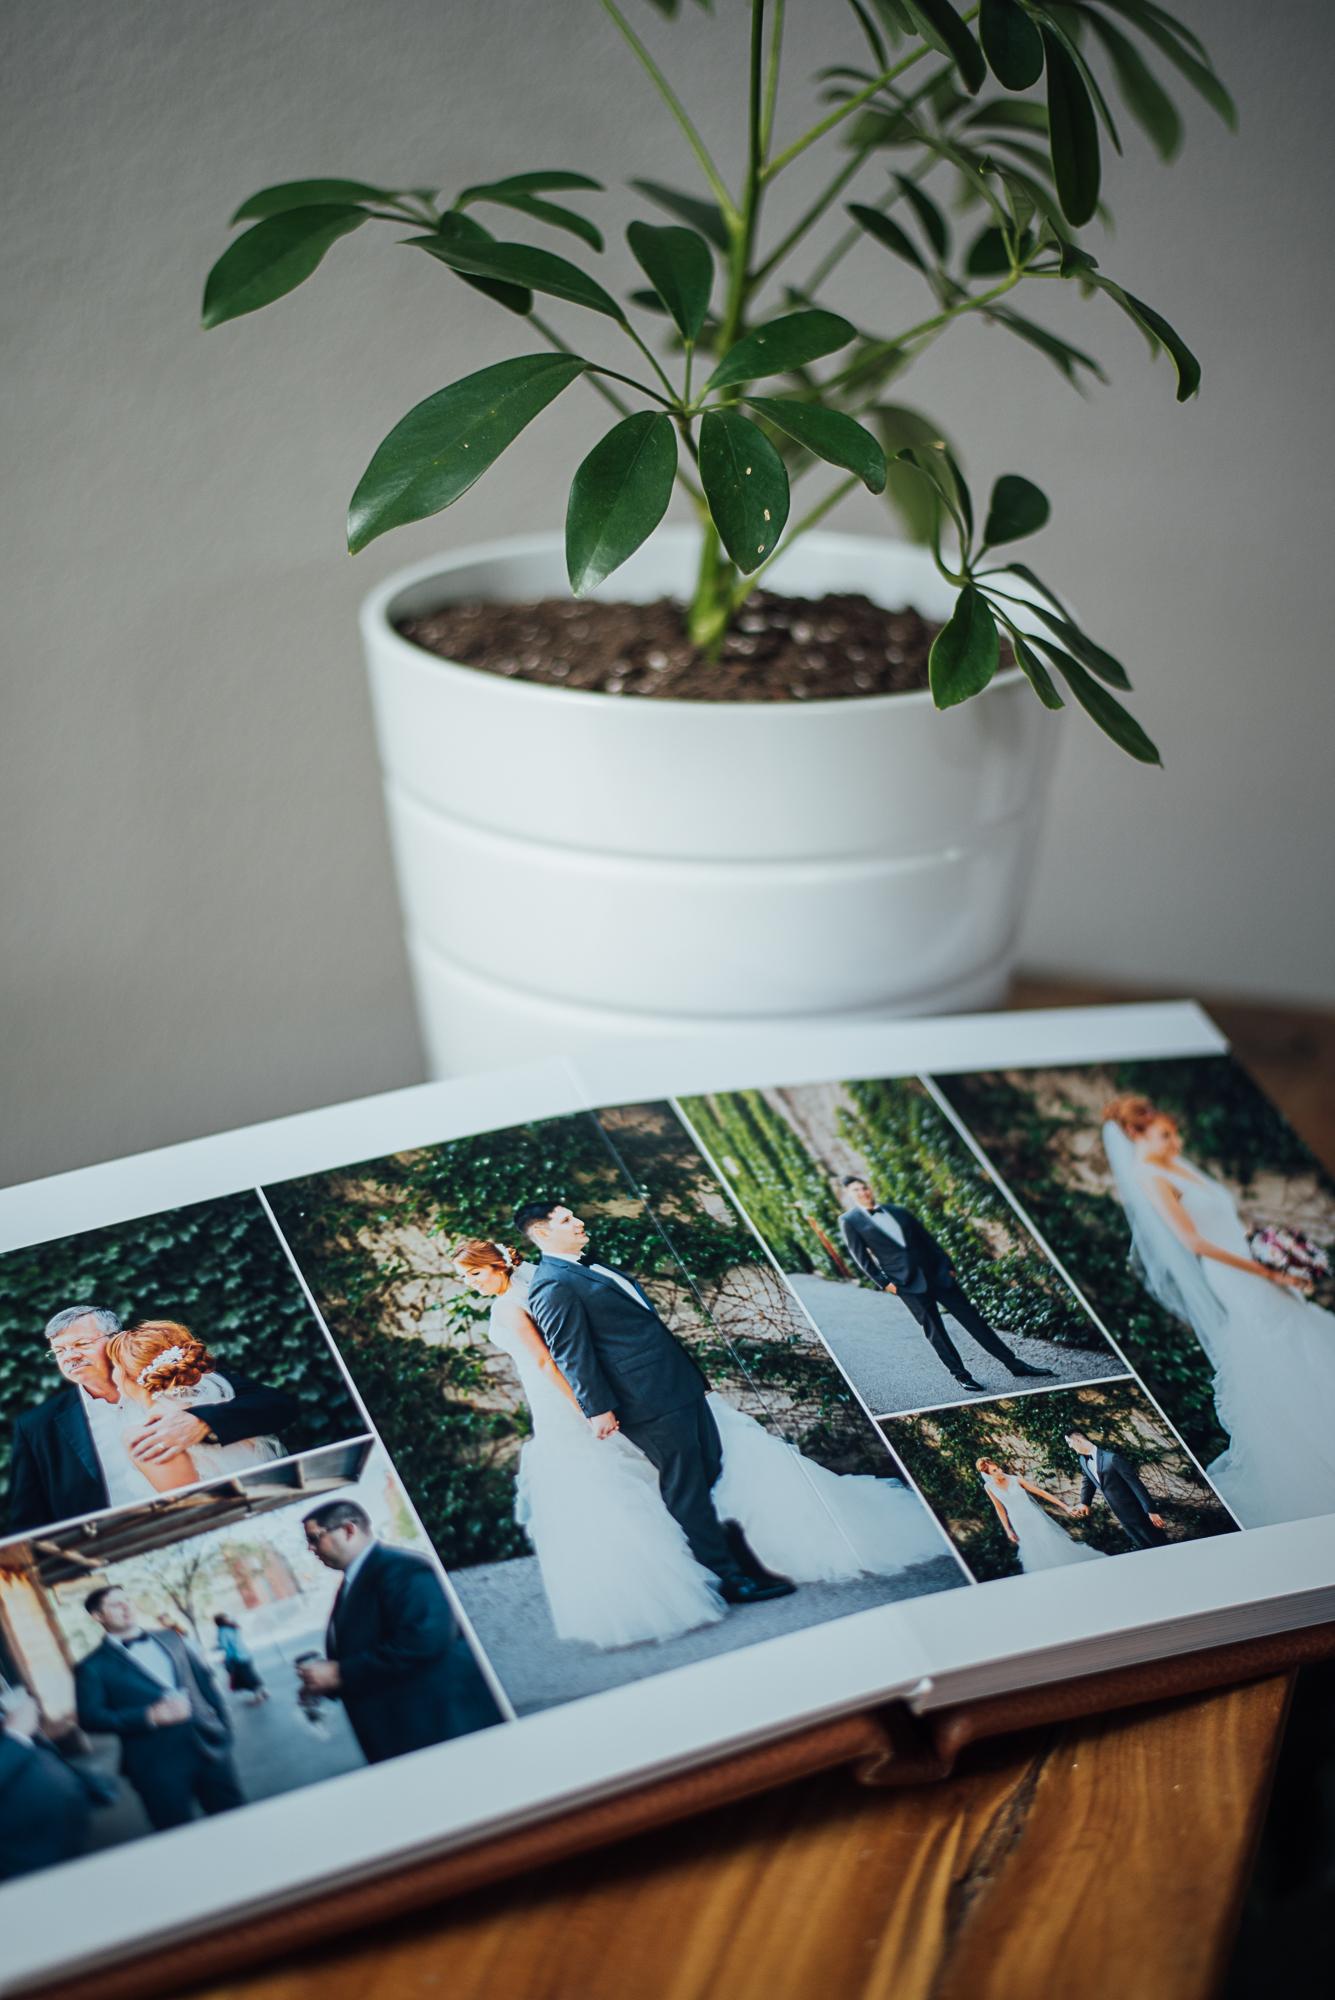 redtree album-21.jpg